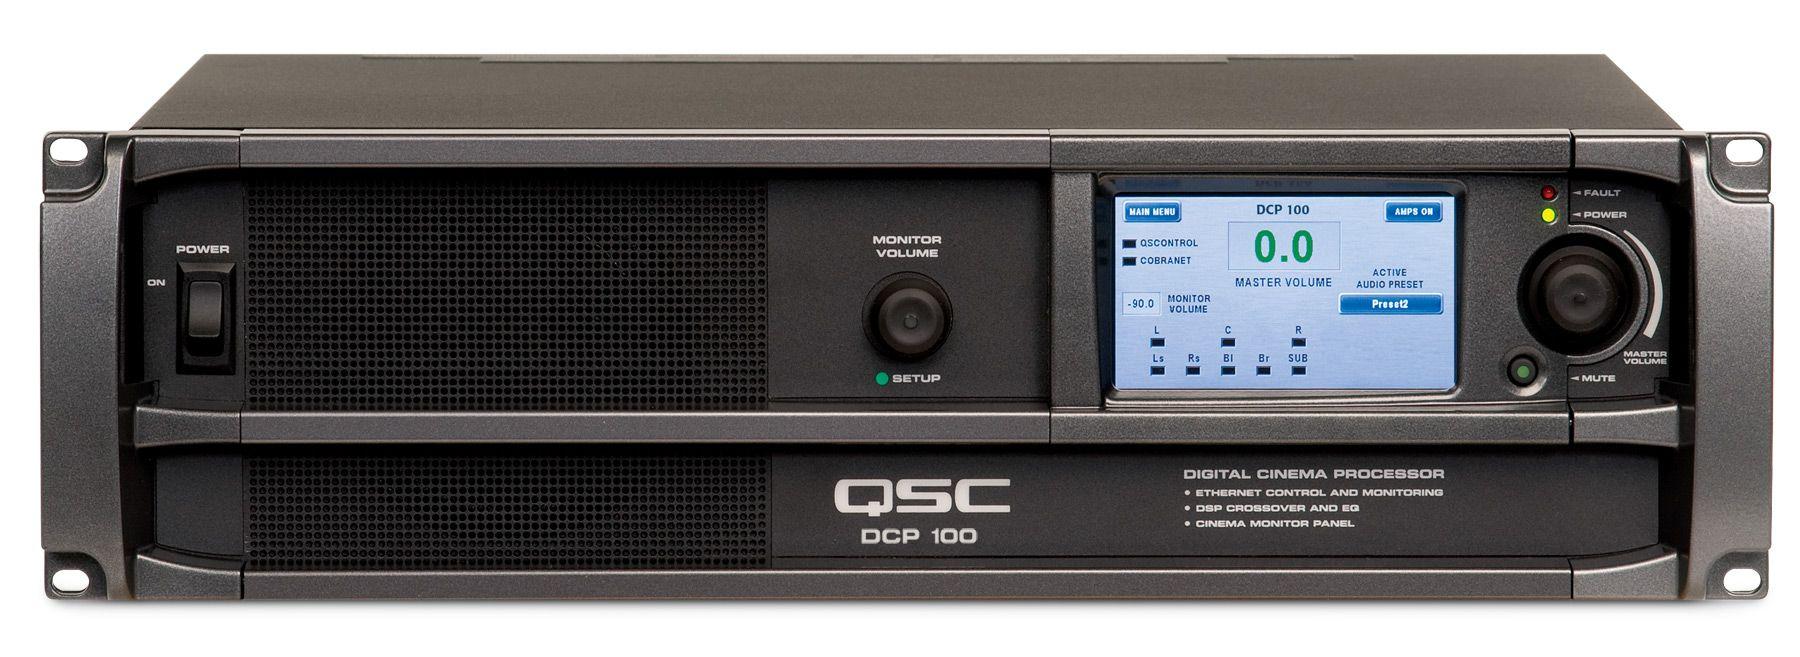 qsc Цифровой кинопроцессор QSC Cinema DCP 100